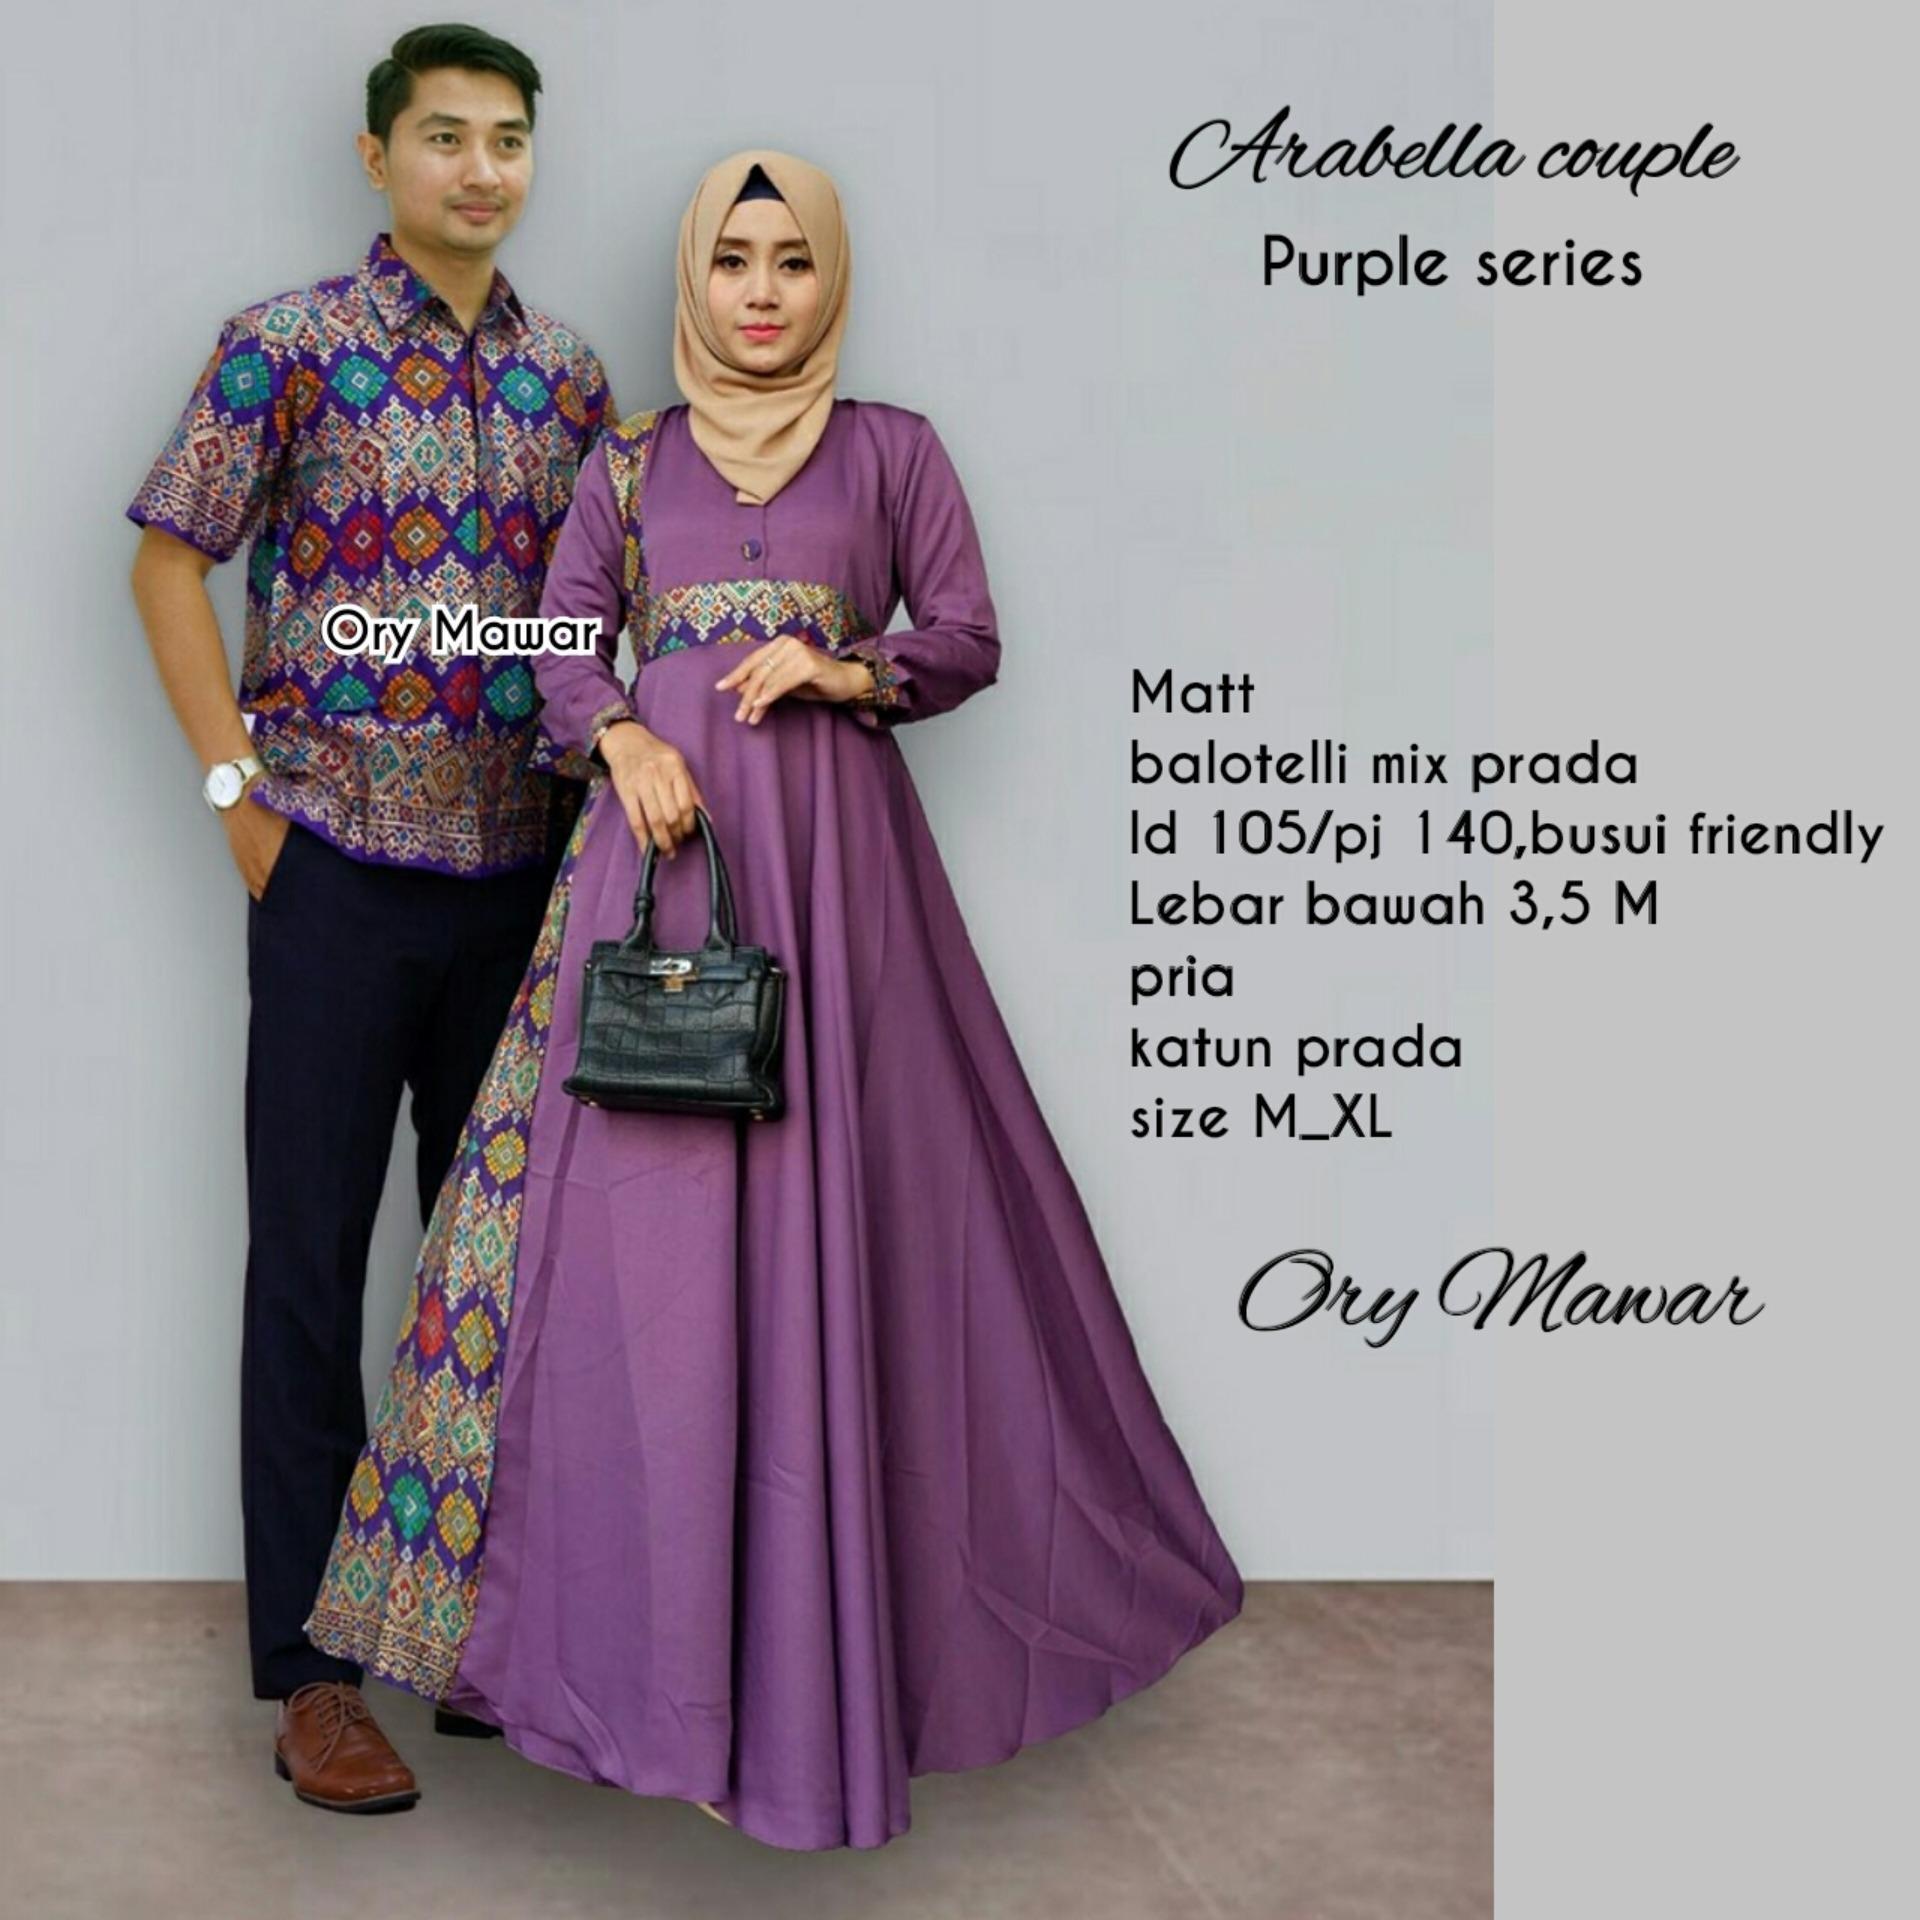 Id-test-11.slatic.net/p/7/batik-couple-baju-batik-.